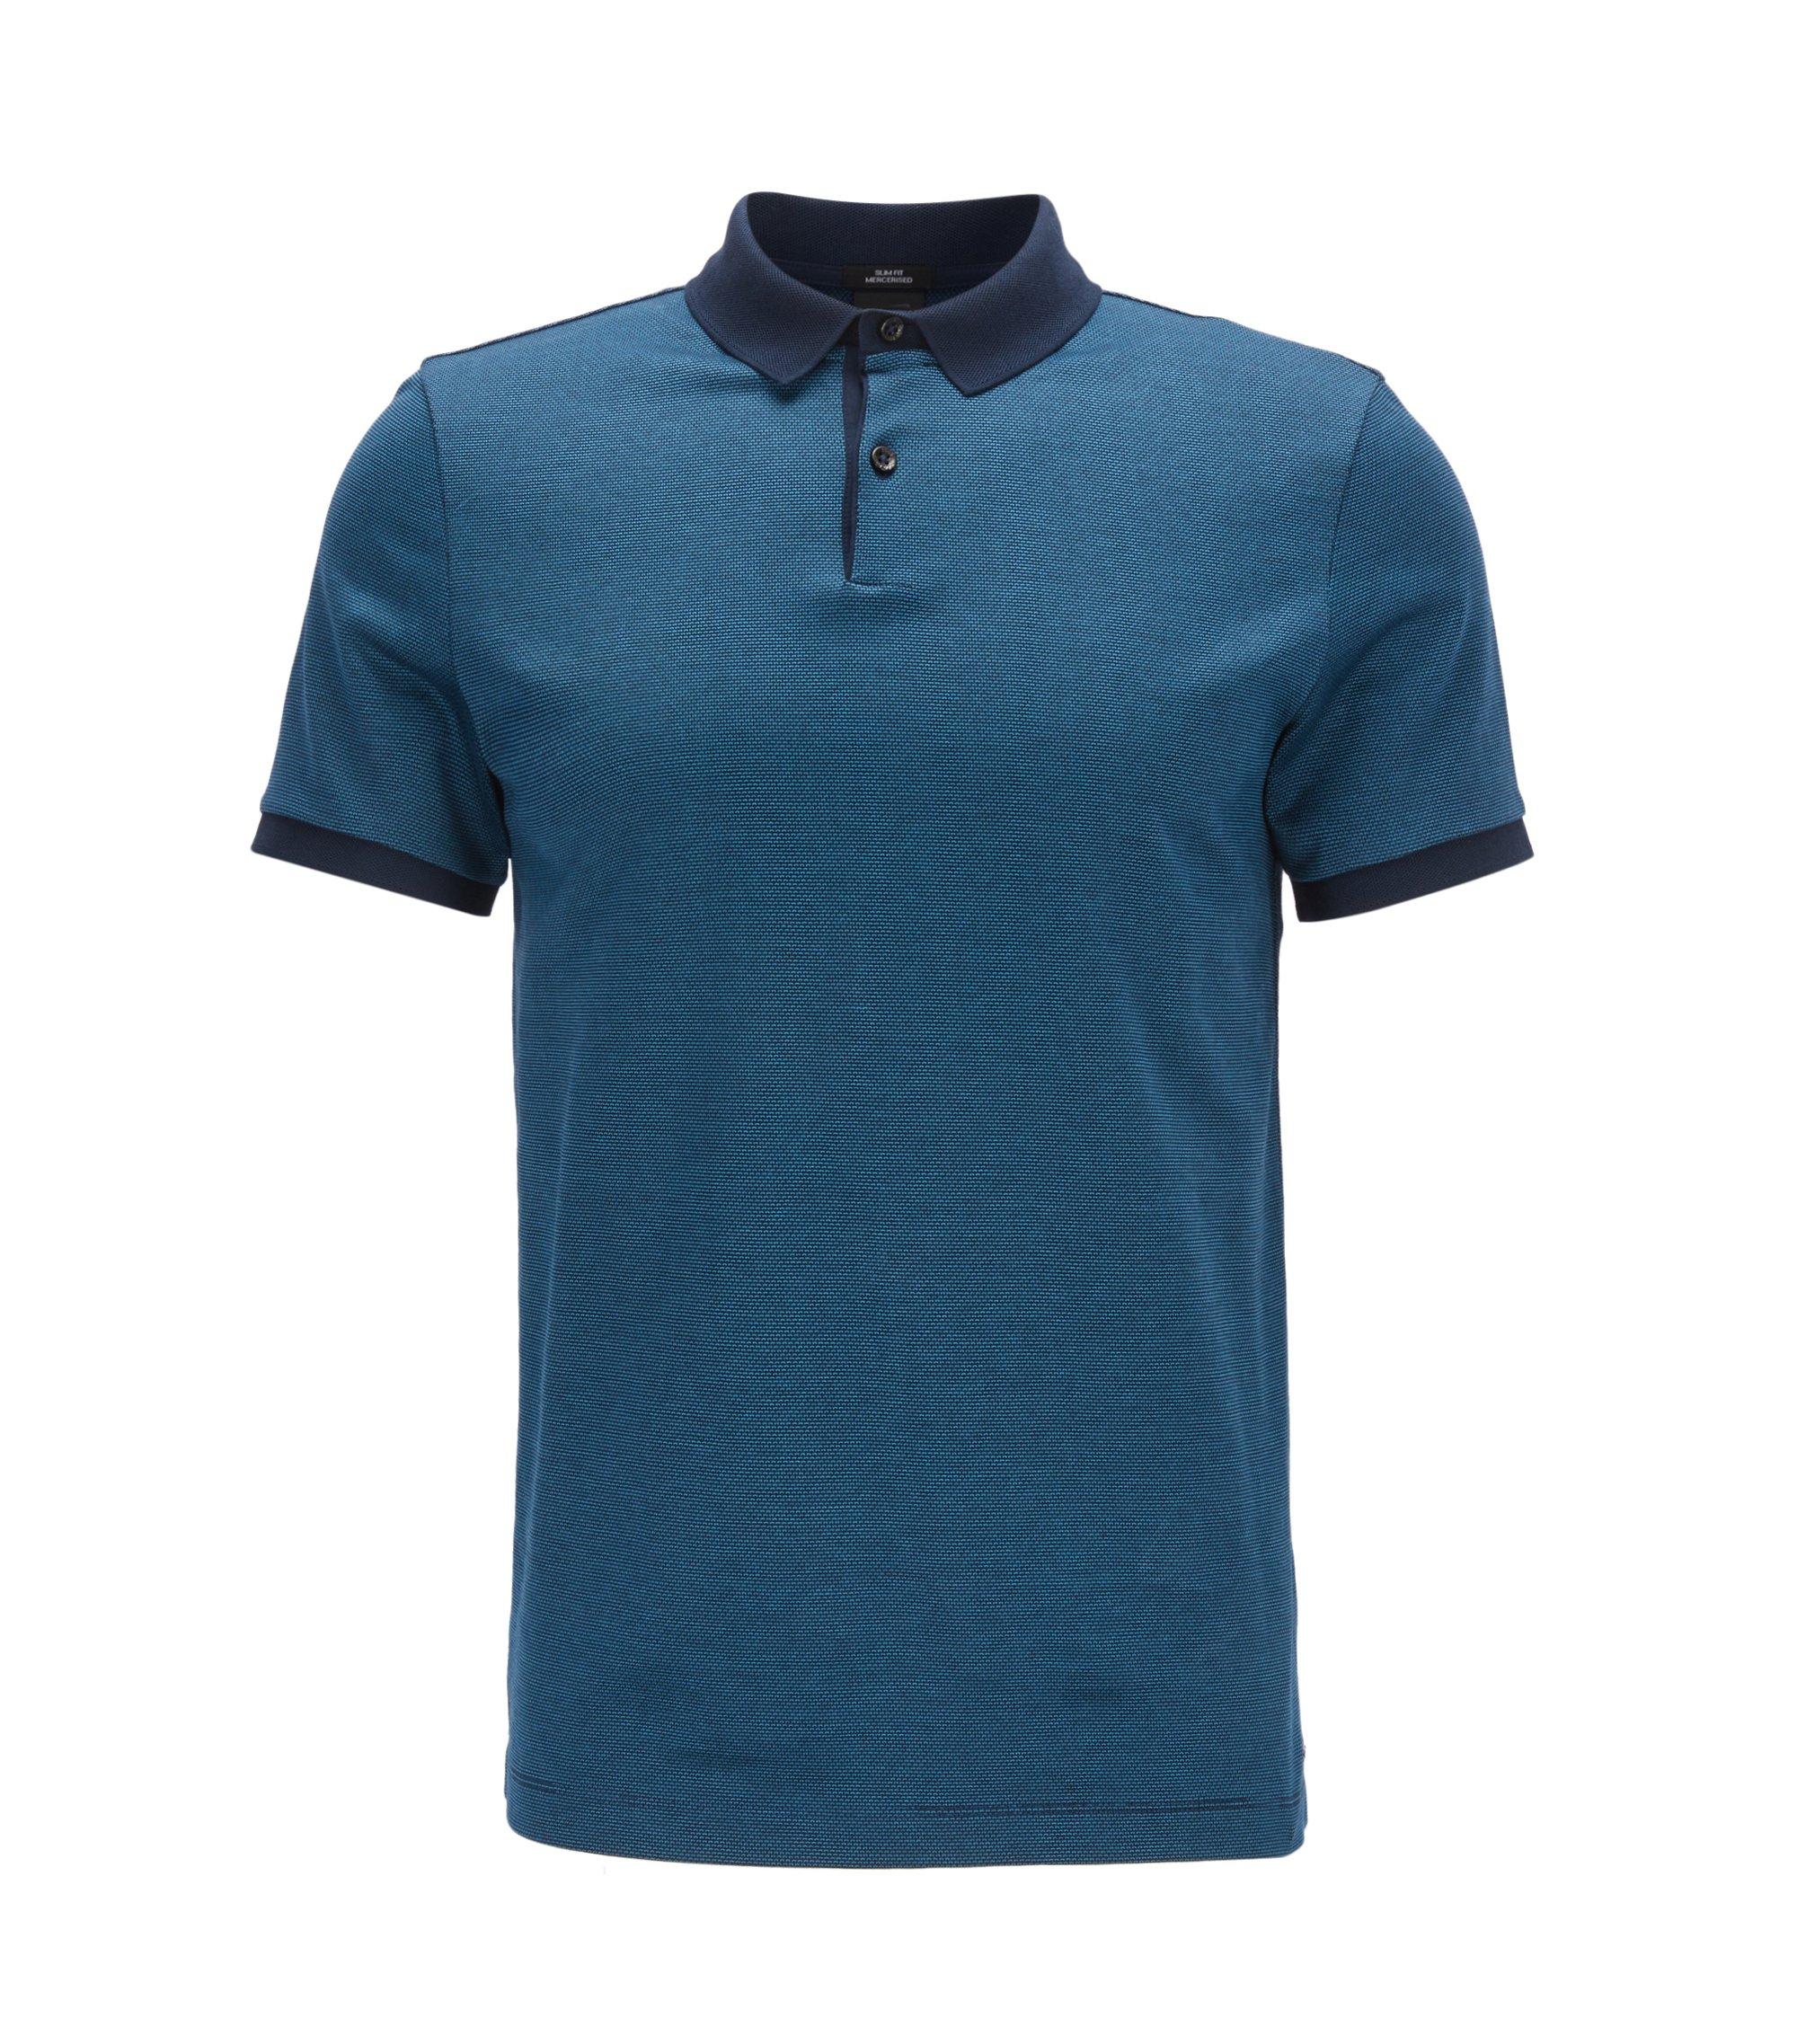 Slim-Fit Poloshirt aus merzerisiertem Baumwoll-Jacquard, Dunkelblau